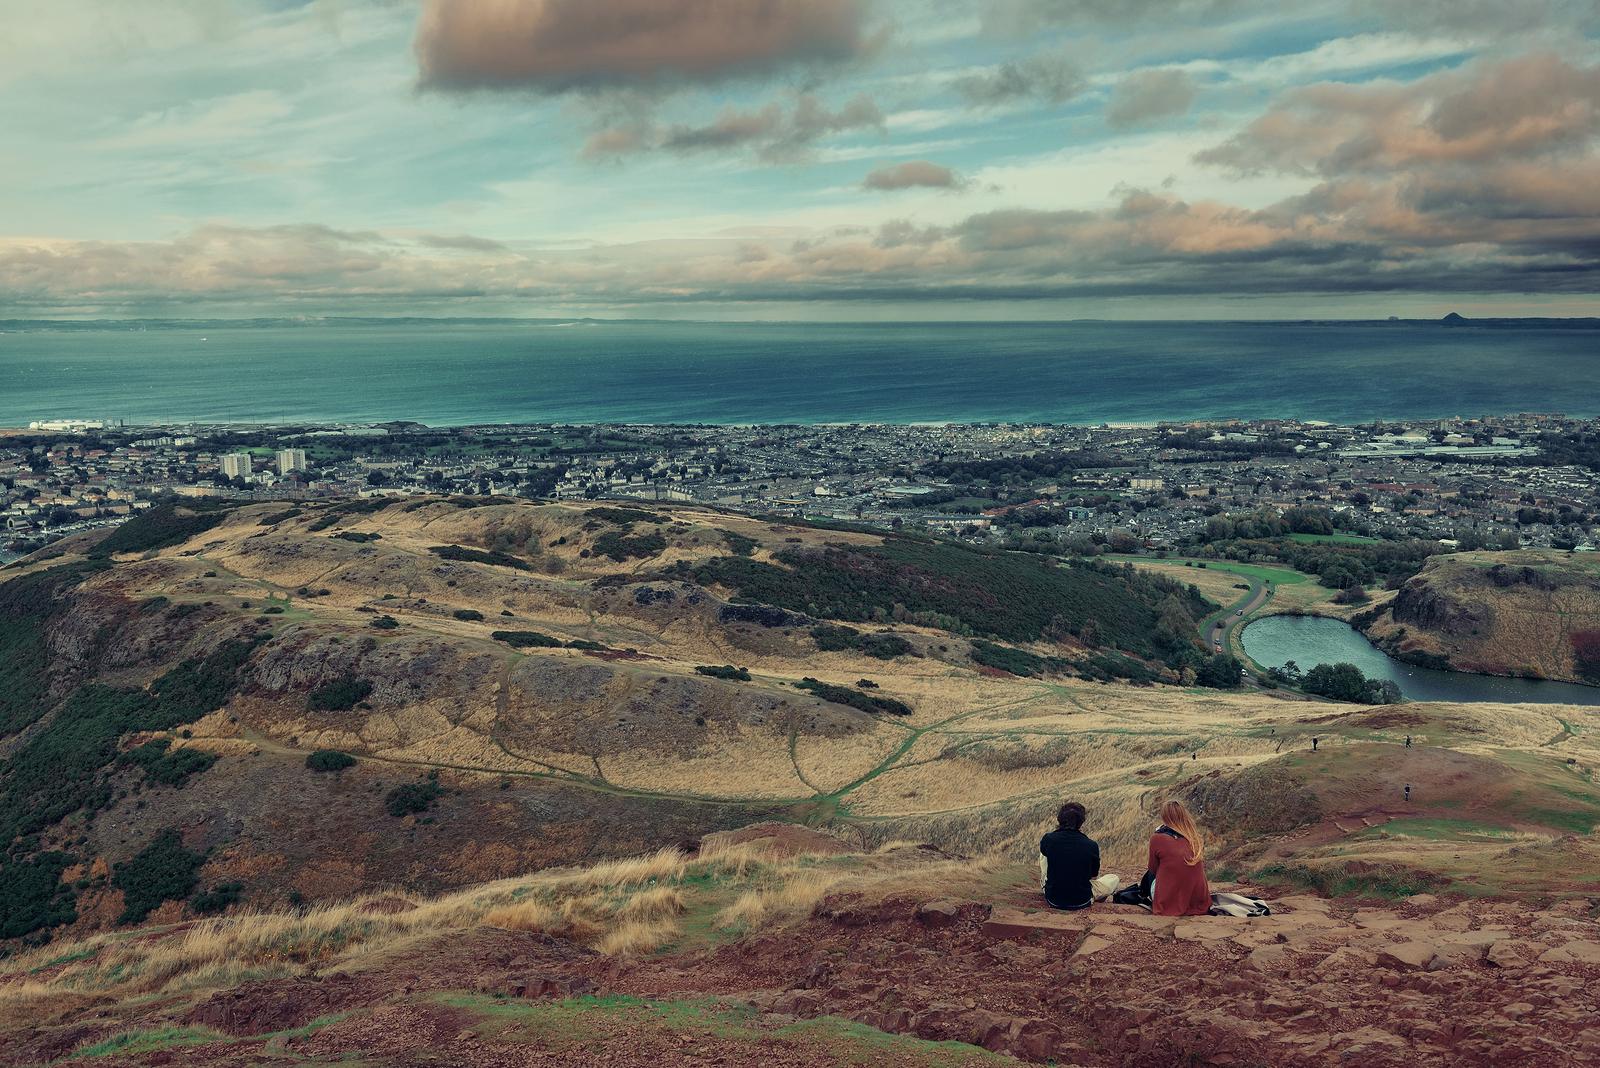 Right in the centre of Edinburgh rises Arthur's Seat, a long dormant volcano and famous Scottish walk